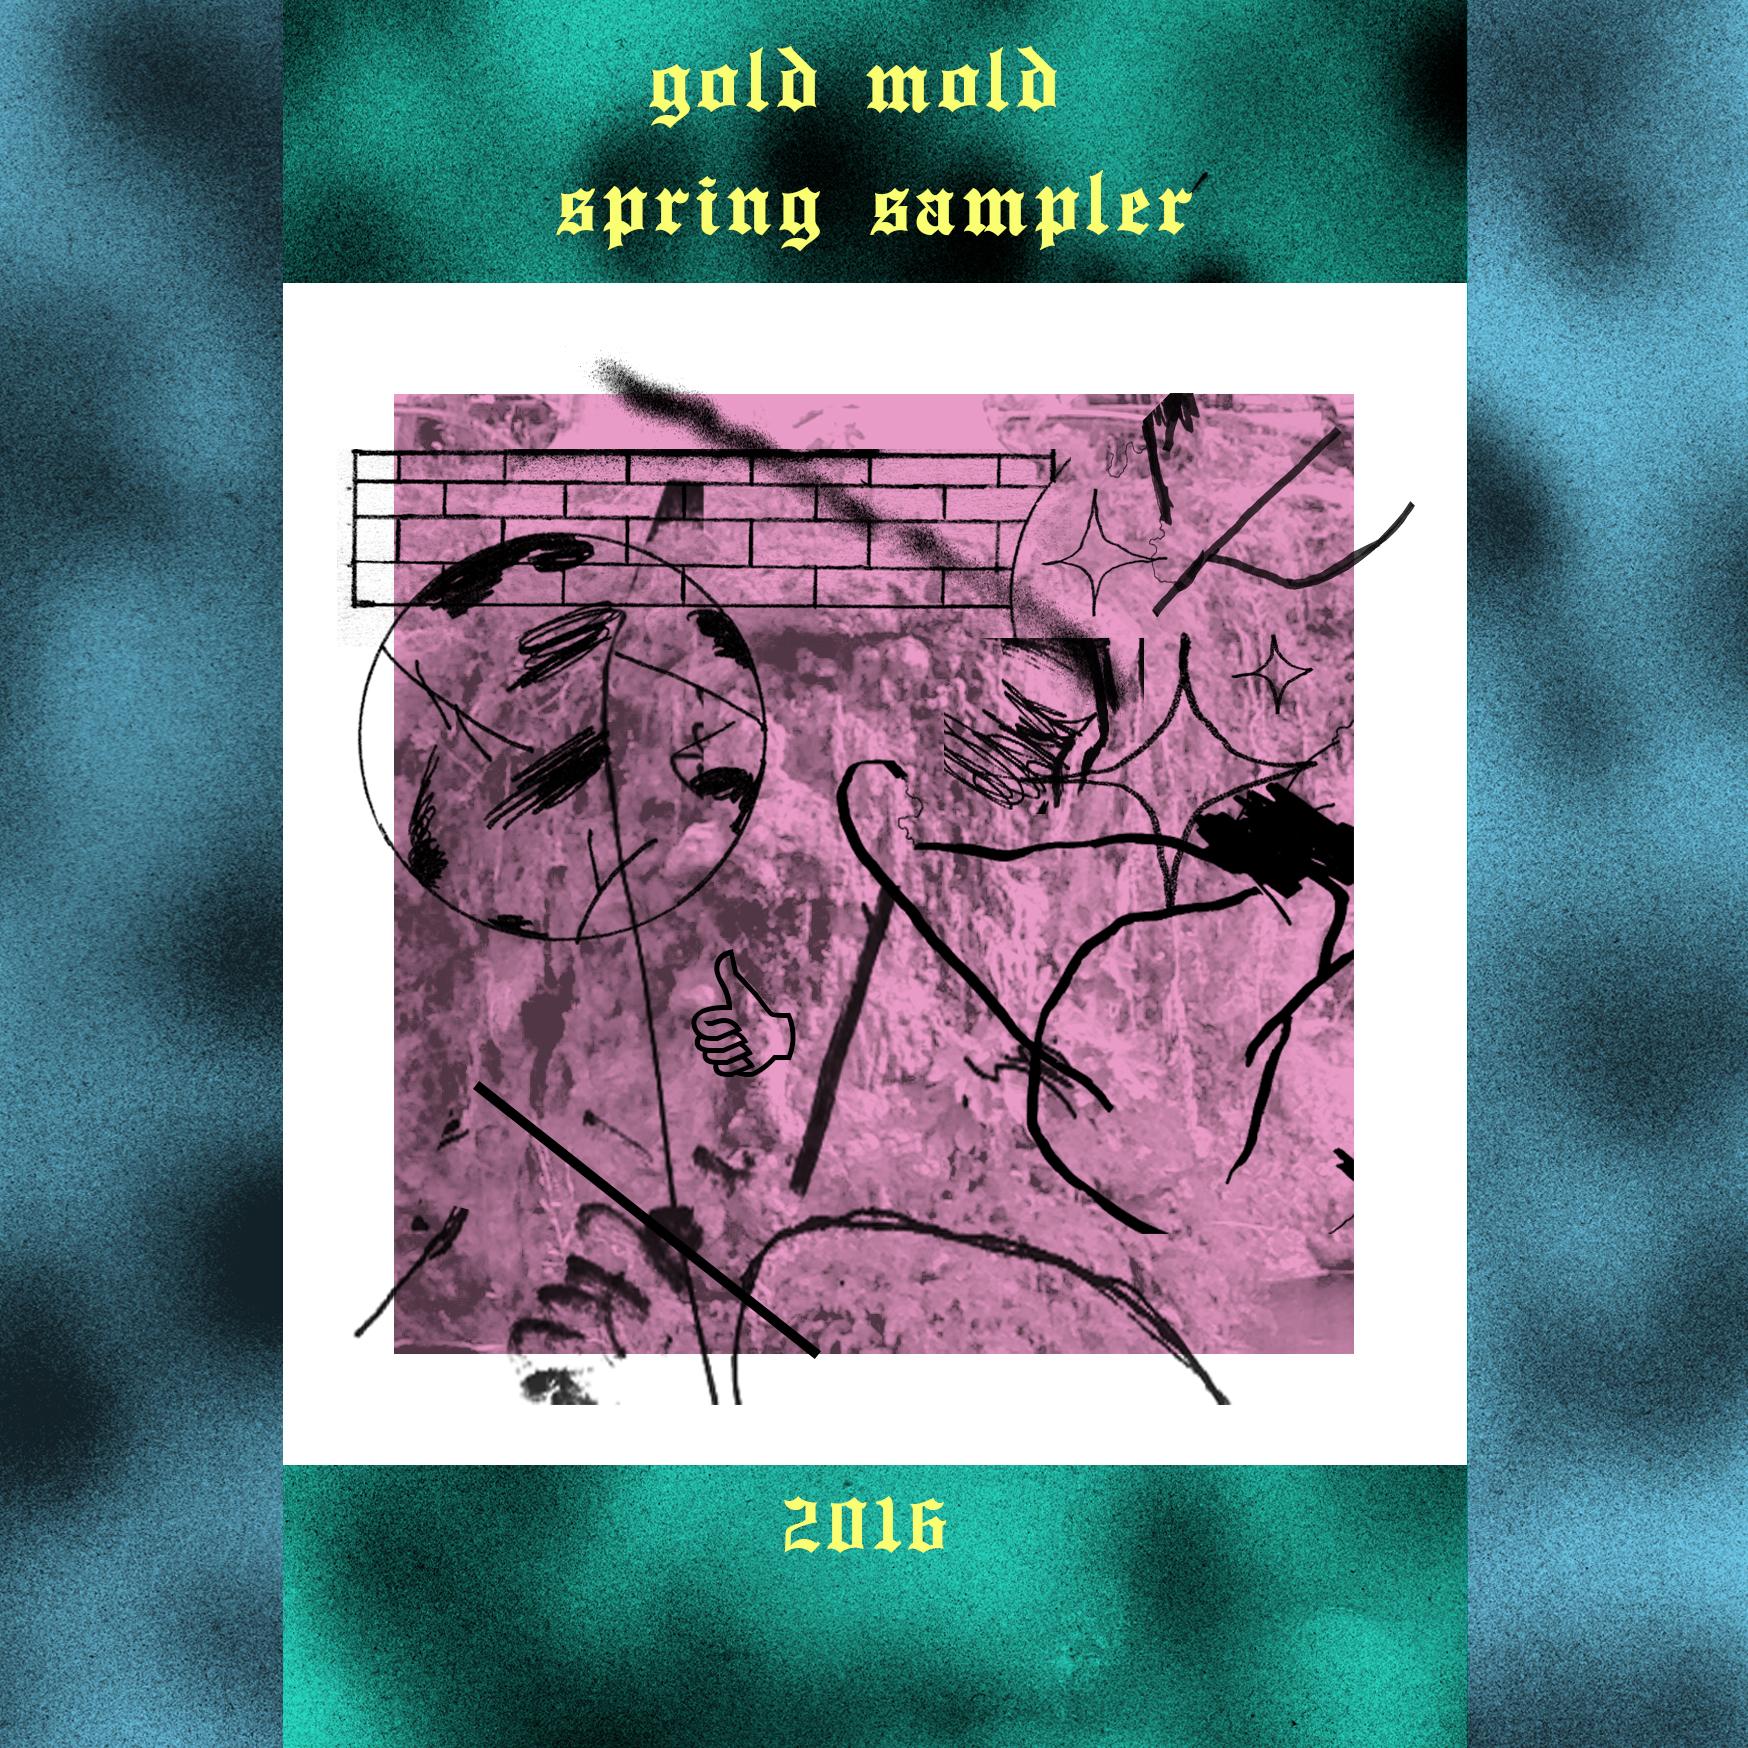 Spring Sampler 2016